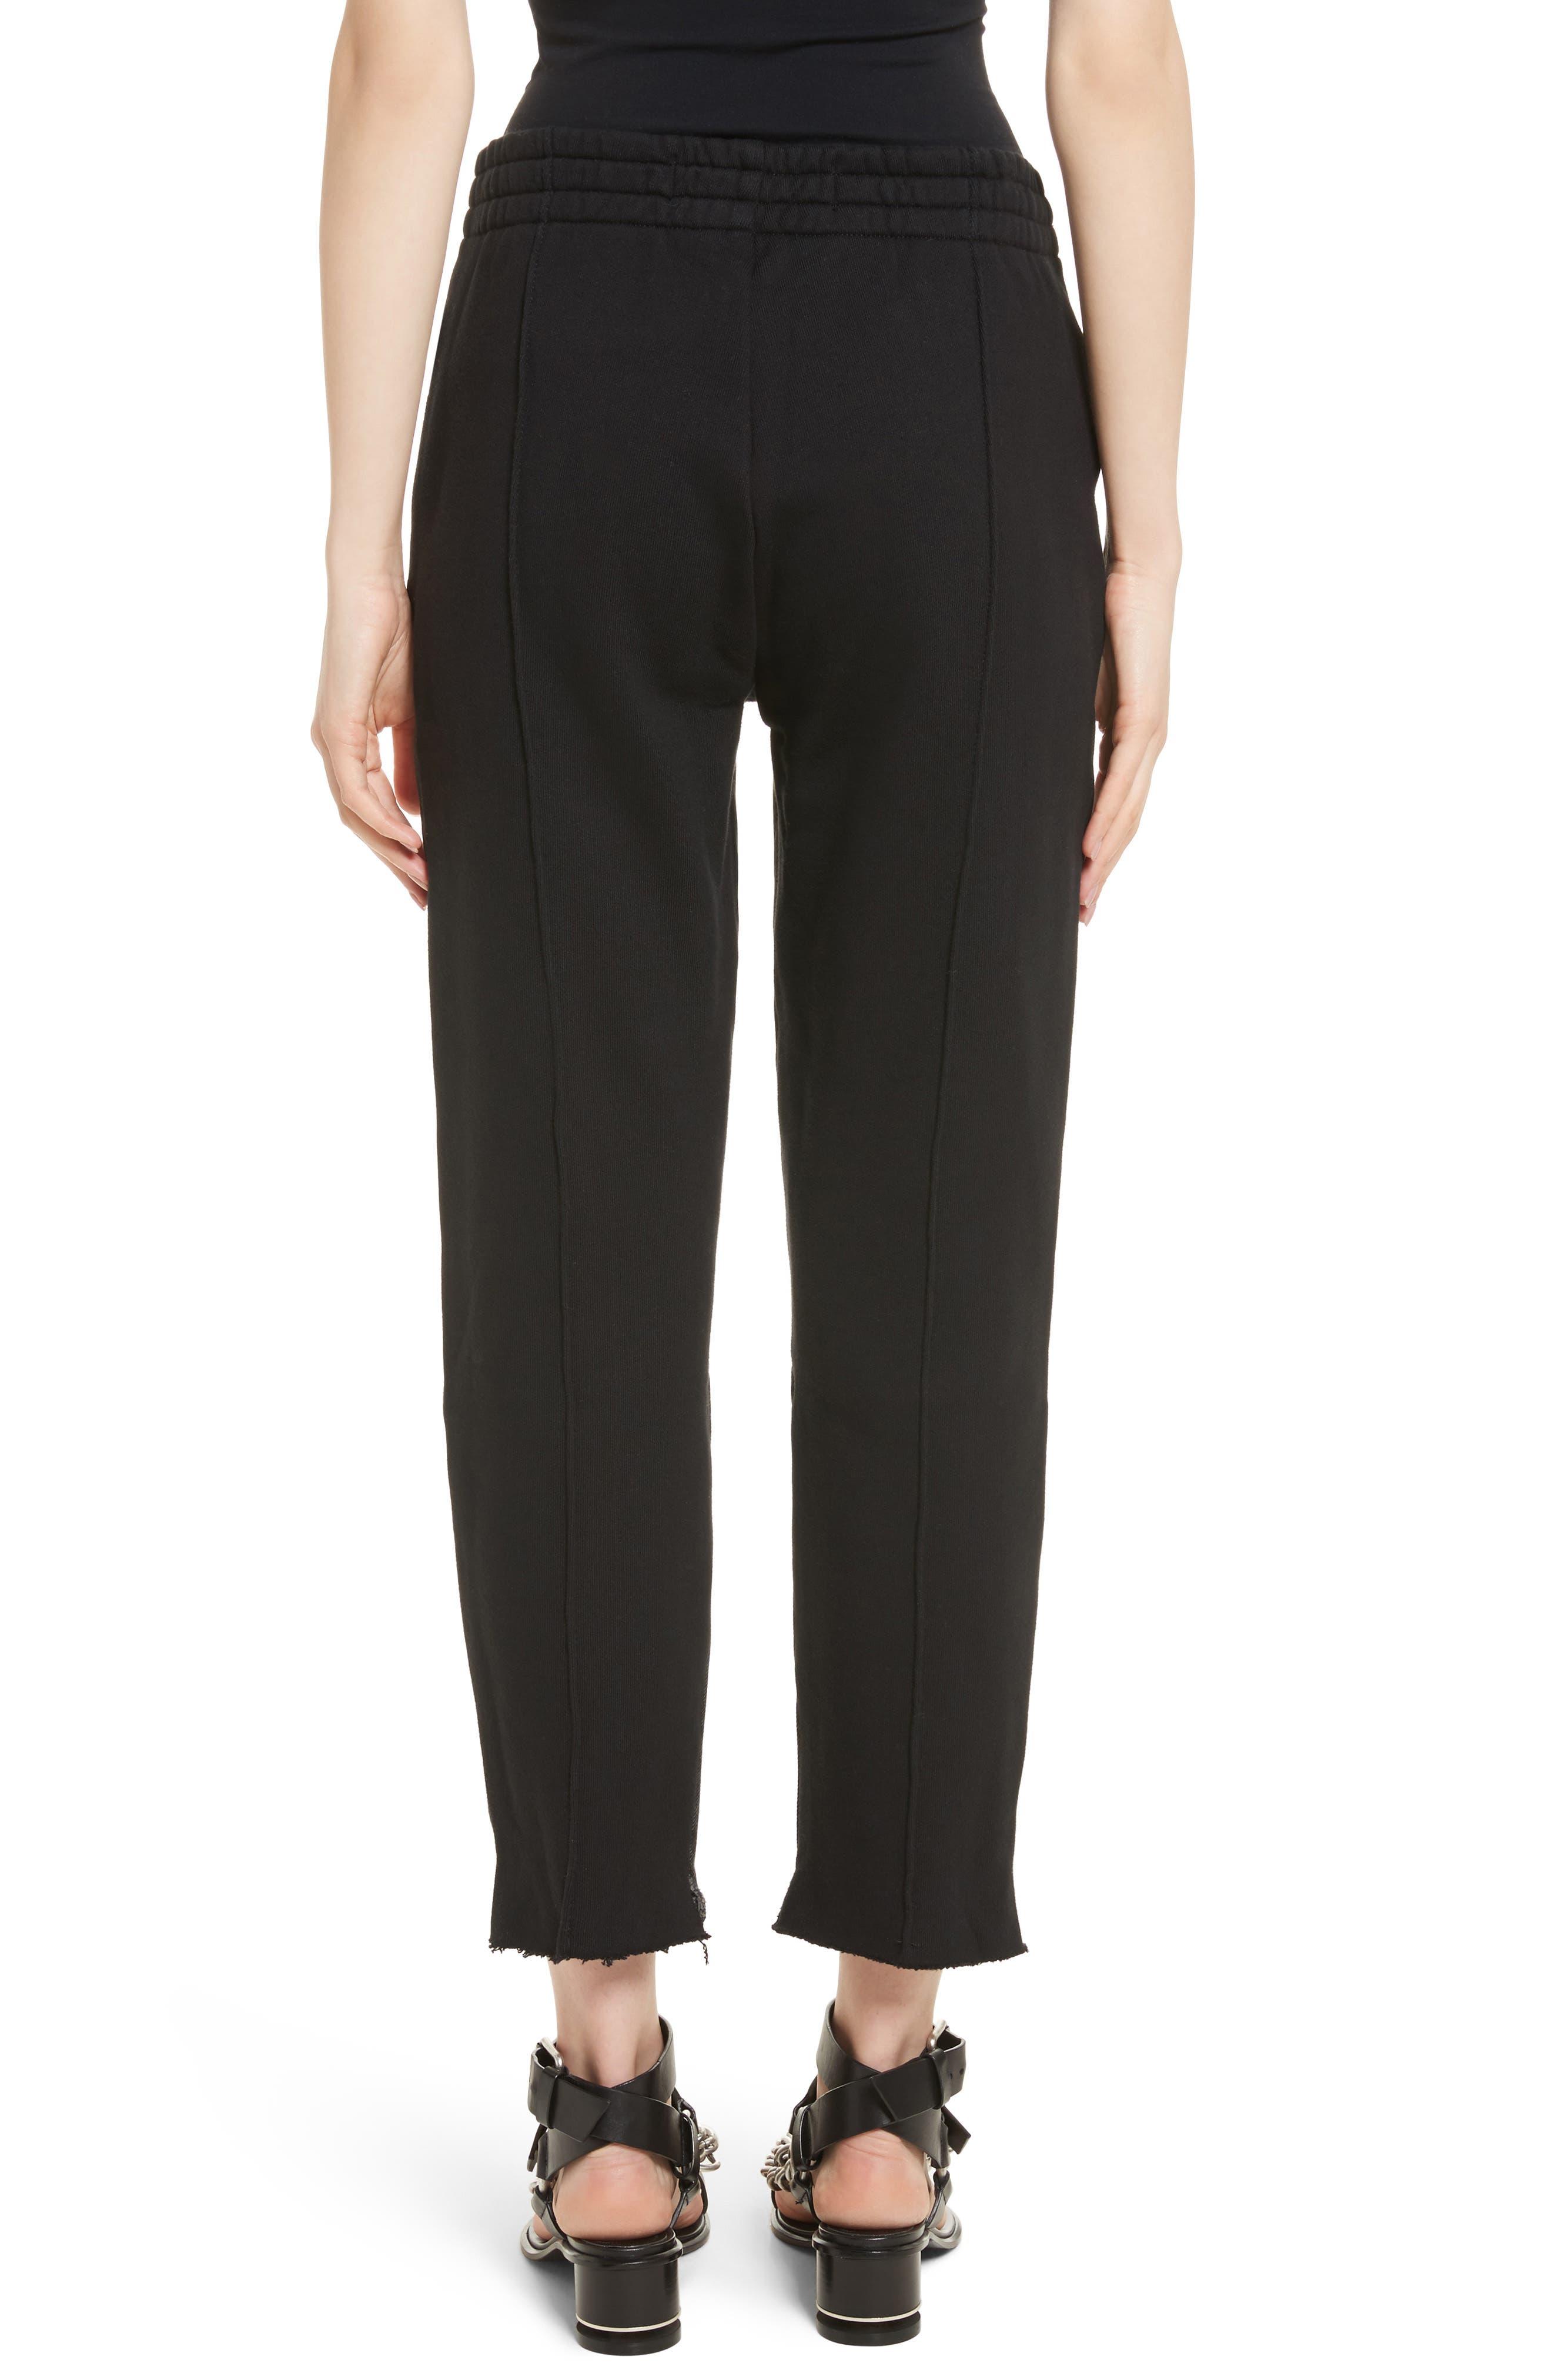 Denim x Alexander Wang Hybrid Sweatpants Jeans,                             Alternate thumbnail 2, color,                             025